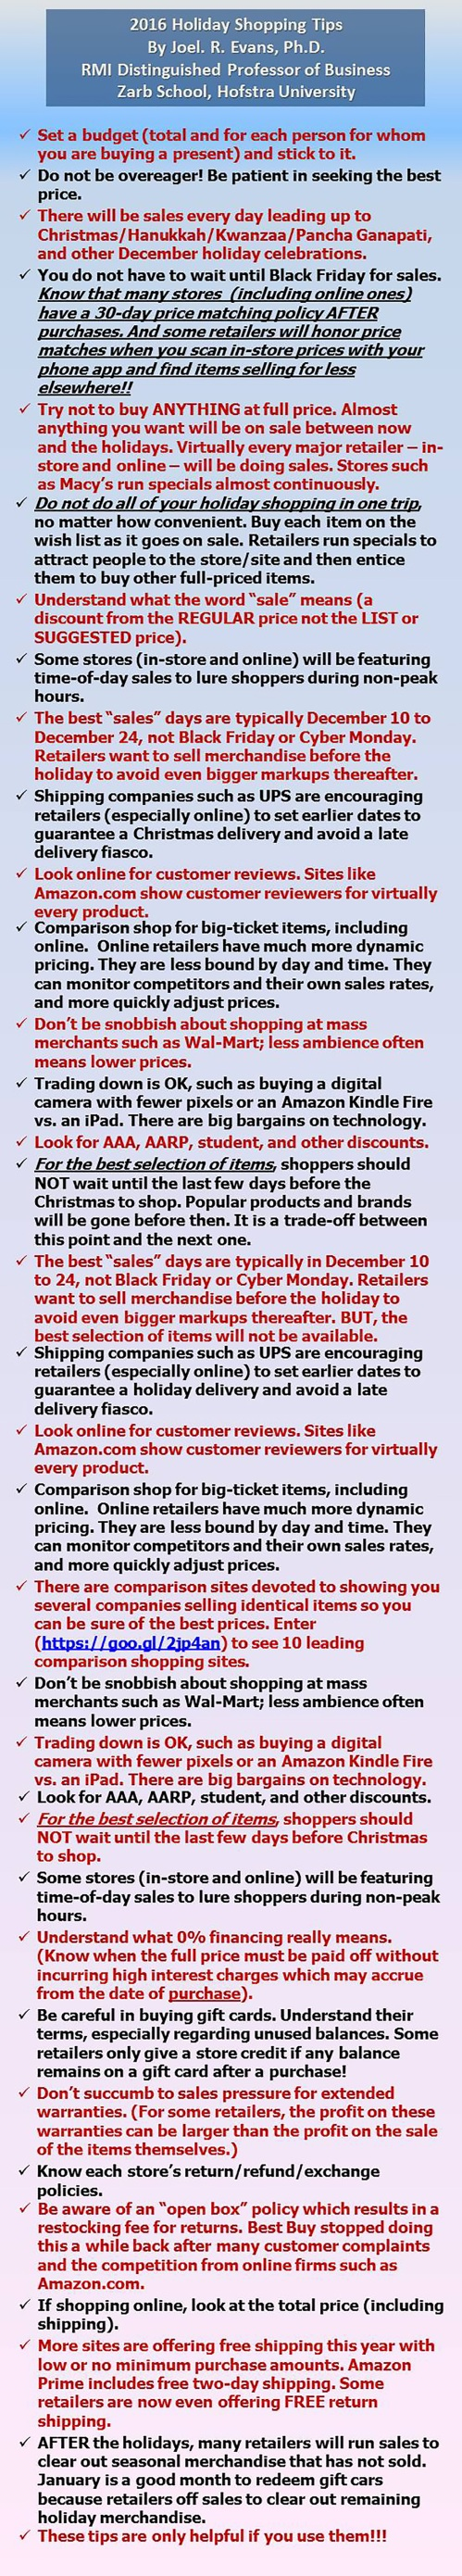 2016-shopping-tips